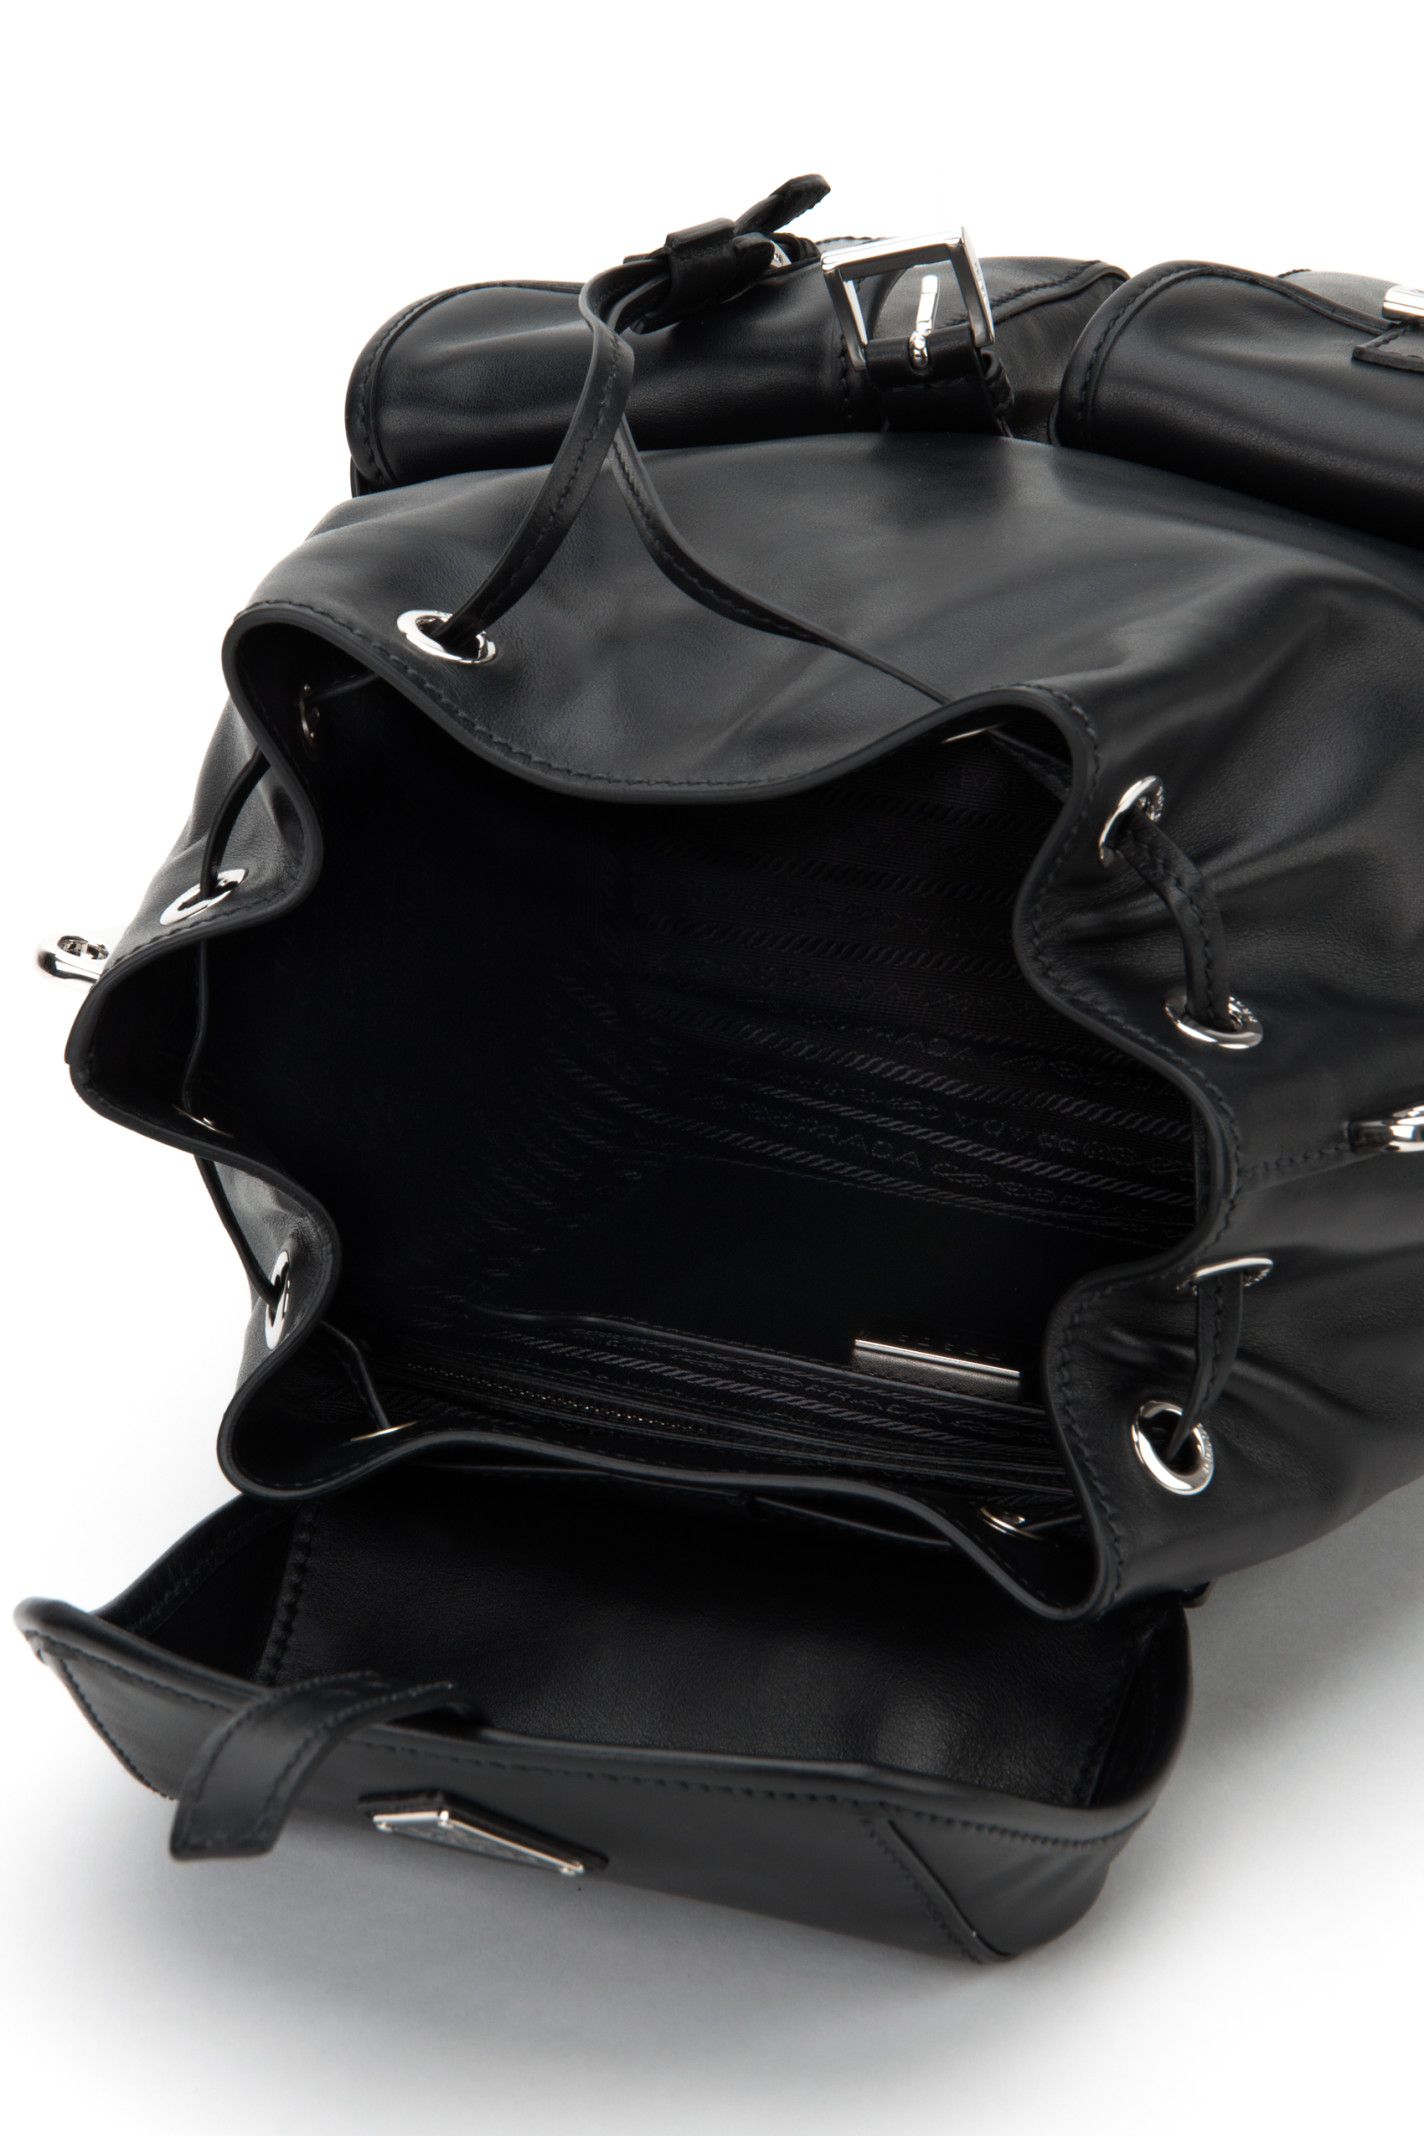 Prada Borsa Soft Calf in Black (NERO)   Lyst